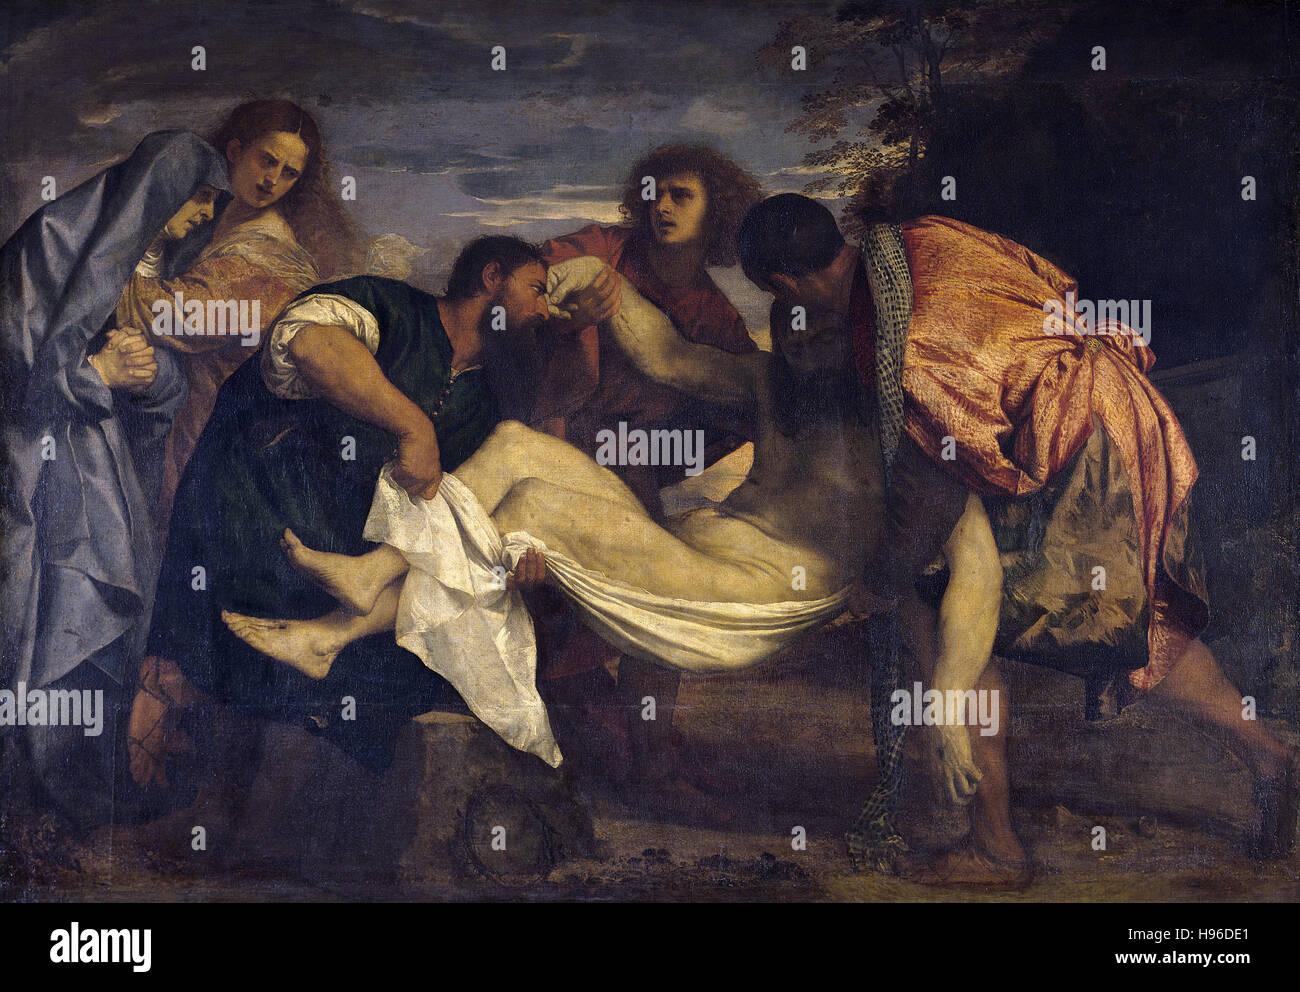 Tiziano Vecelli - Tizian - die Grablegung - 1525 Stockbild